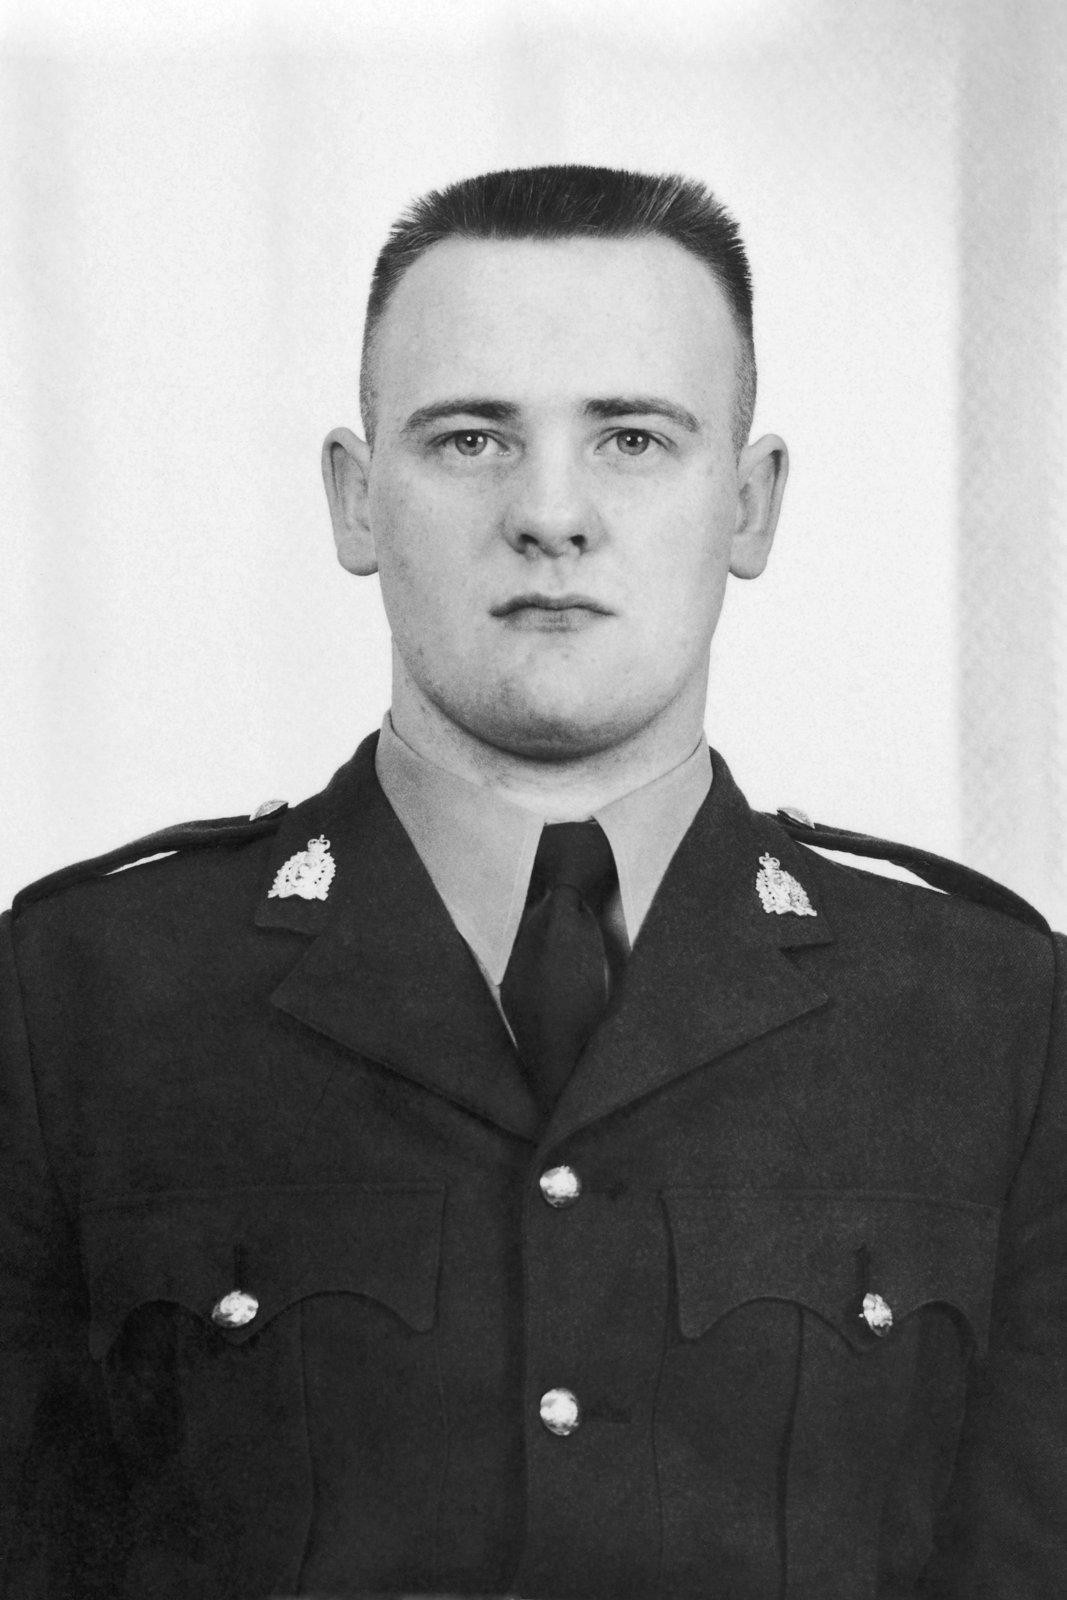 Constable Neil McArthur Bruce